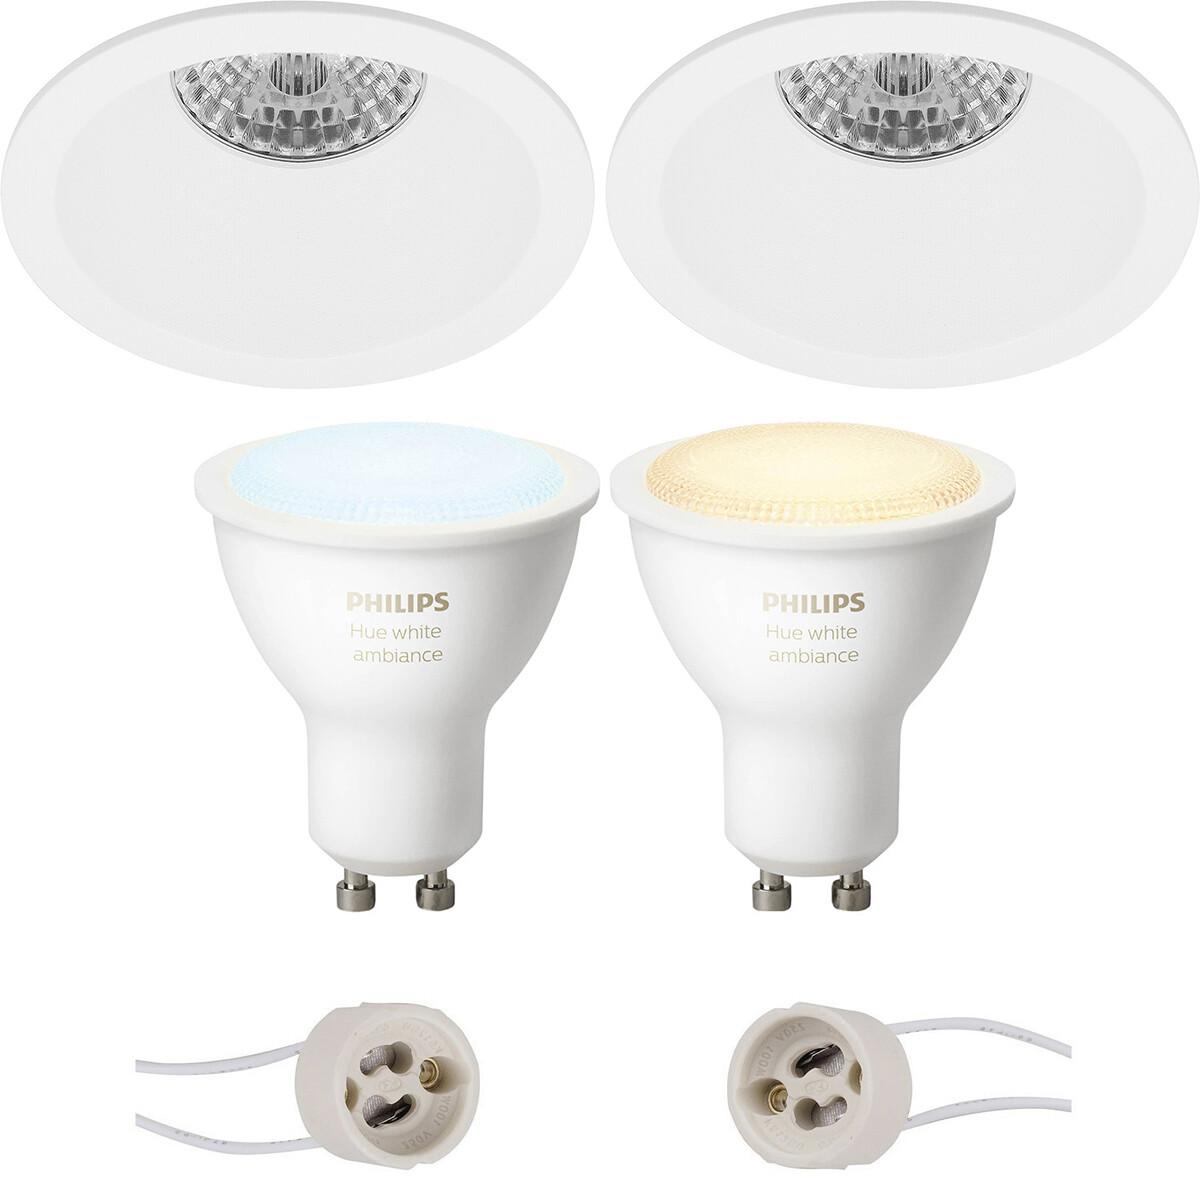 Pragmi Pollon Pro - Inbouw Rond - Mat Wit - Verdiept - Ø82mm - Philips Hue - LED Spot Set GU10 - Whi